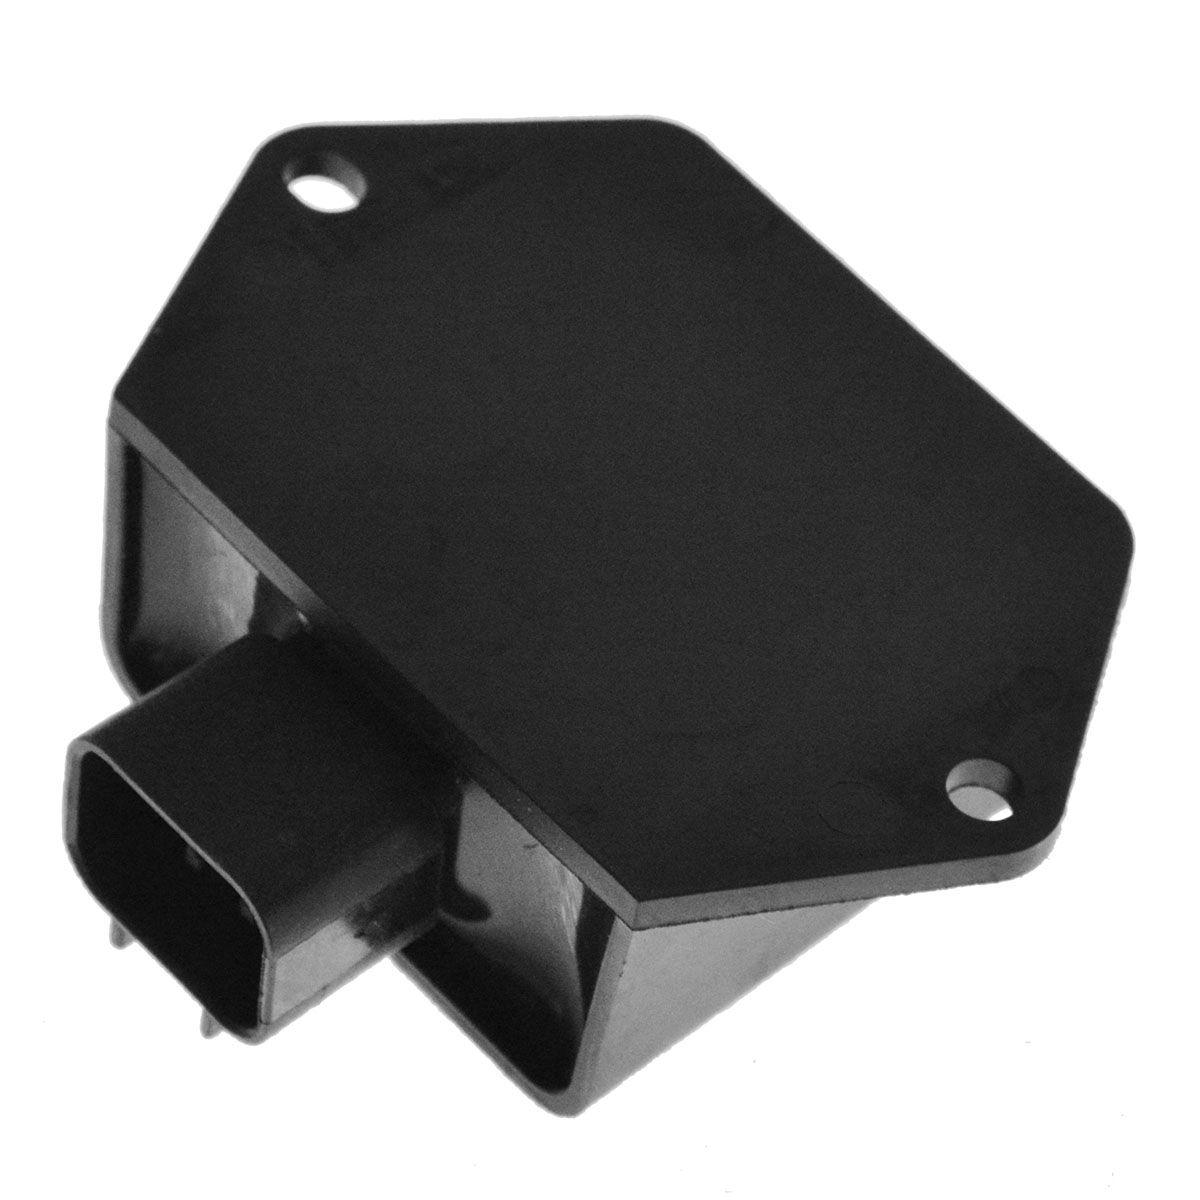 Dorman 704-304 Daytime Running Lamp Module for Jeep